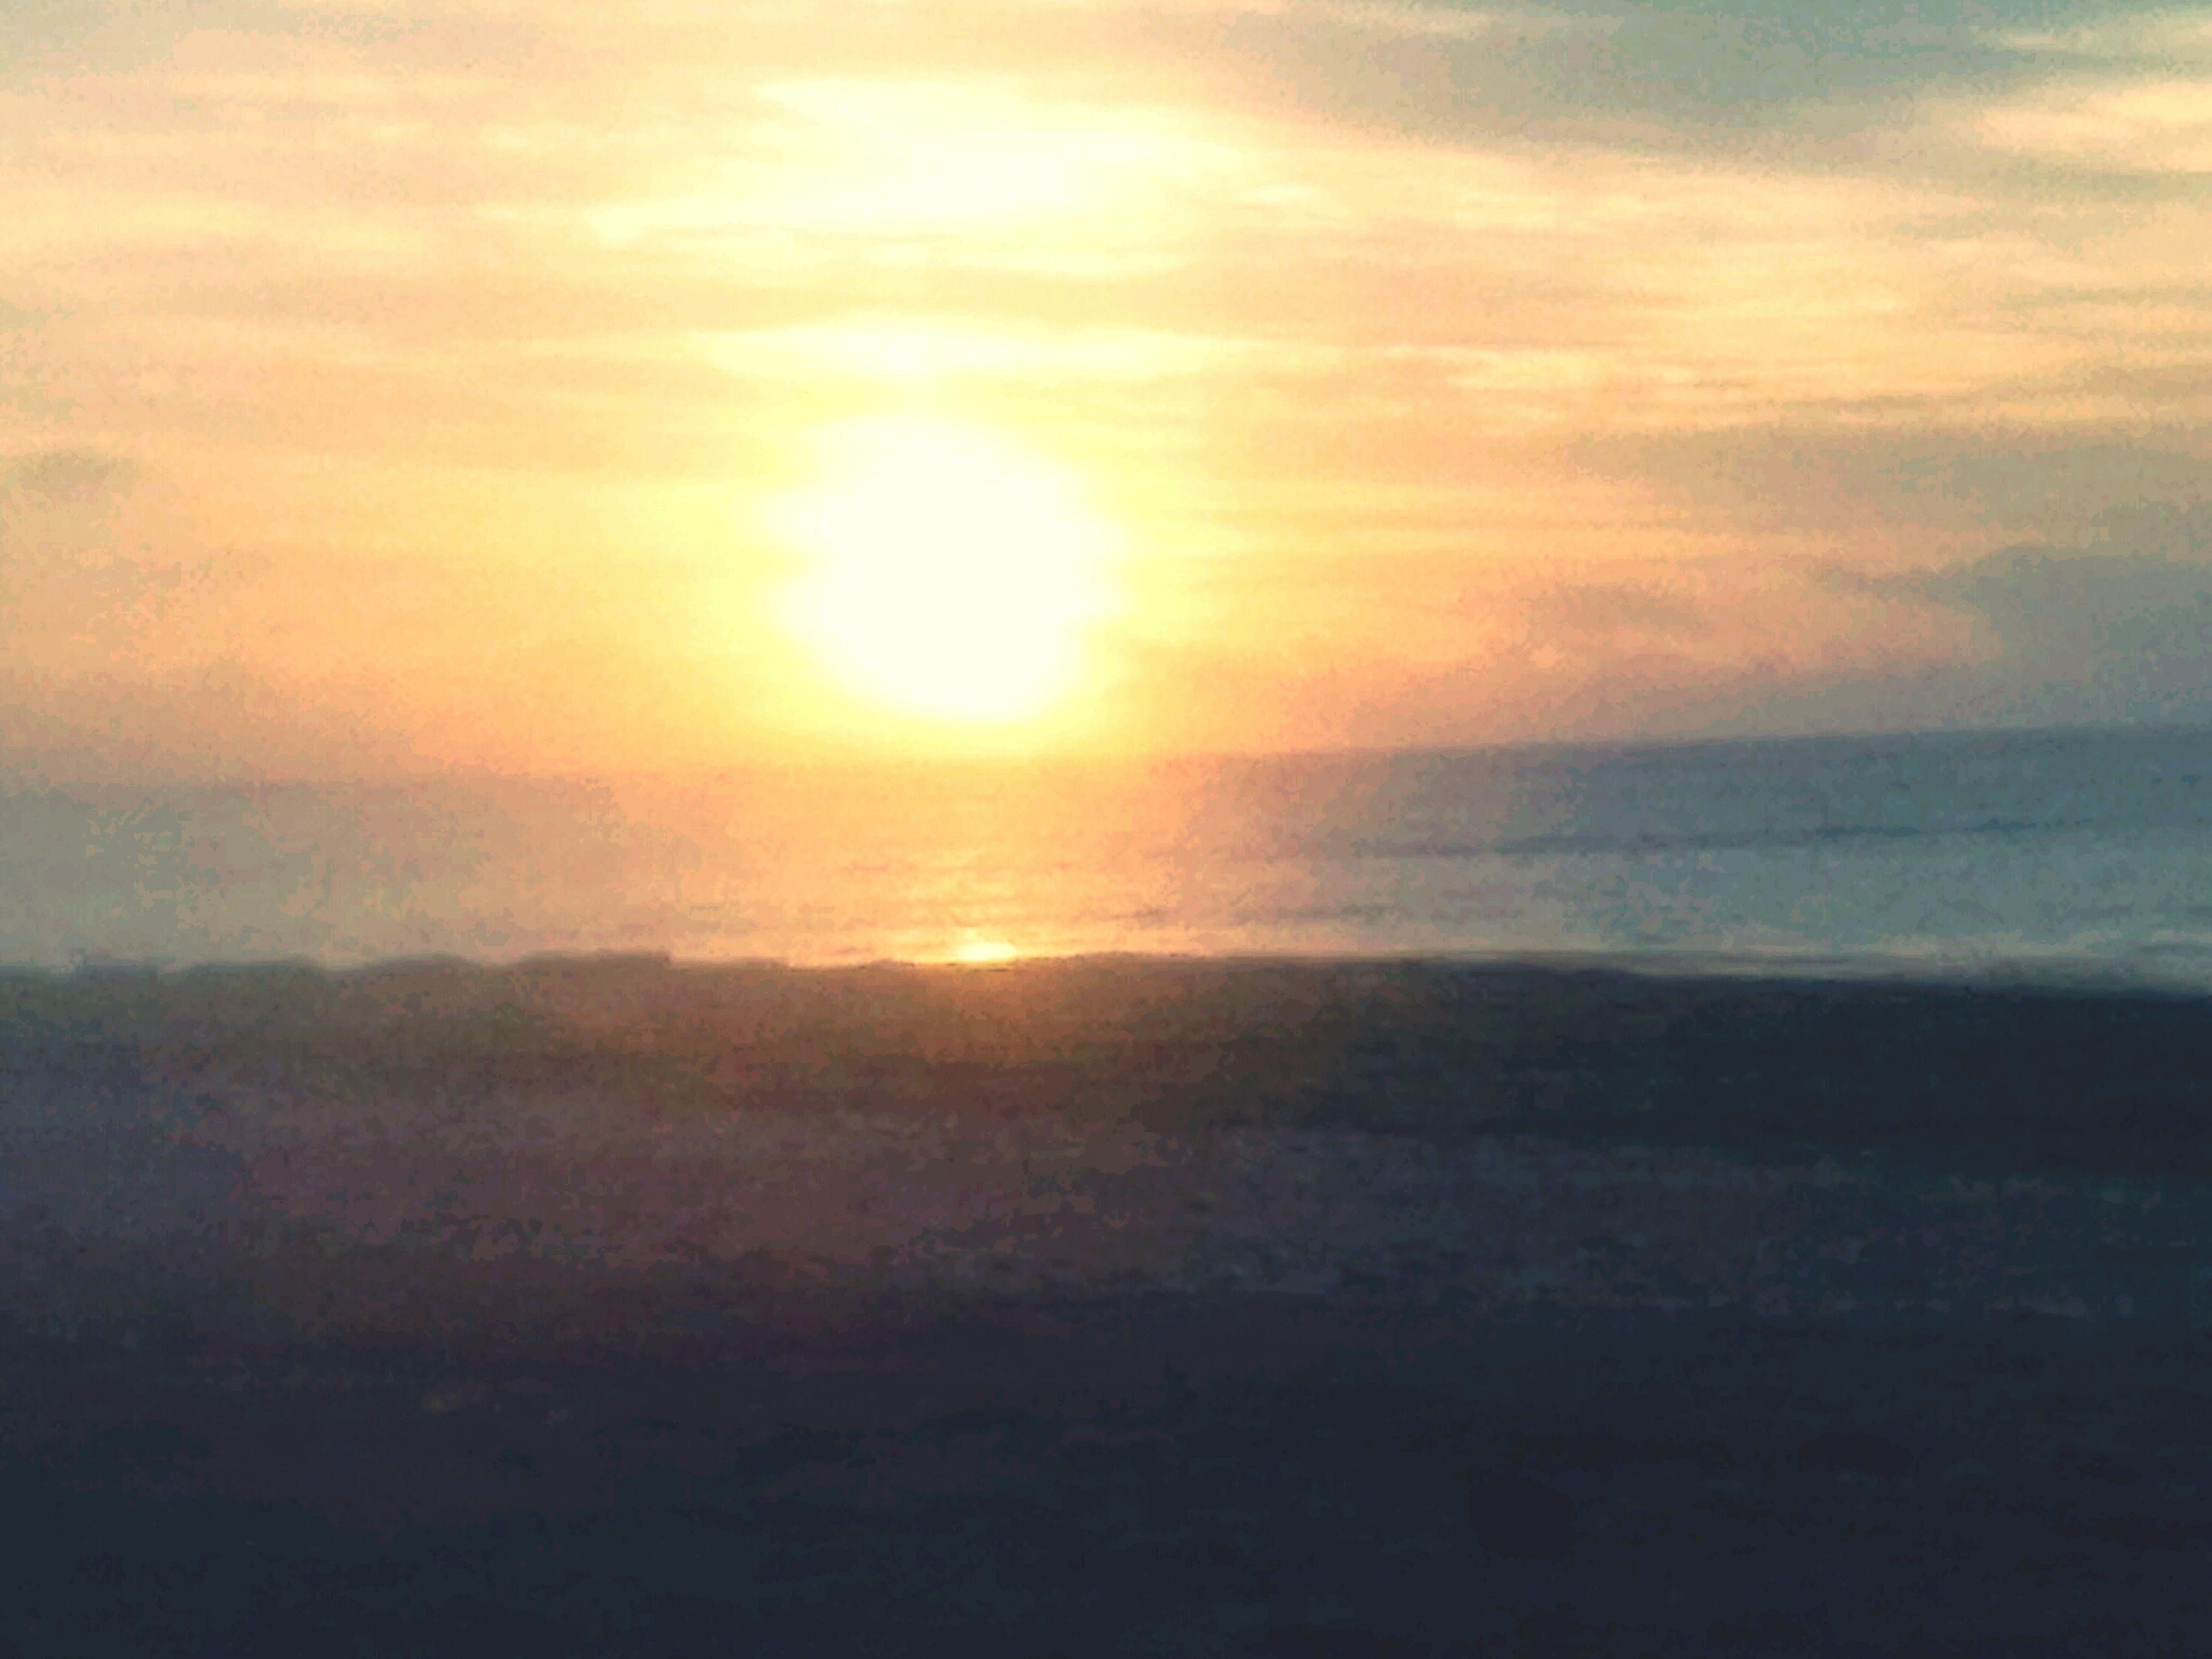 sunset, scenics, sea, sun, tranquil scene, sky, horizon over water, beauty in nature, tranquility, water, cloud - sky, beach, nature, idyllic, orange color, shore, sunlight, sunbeam, cloud, reflection